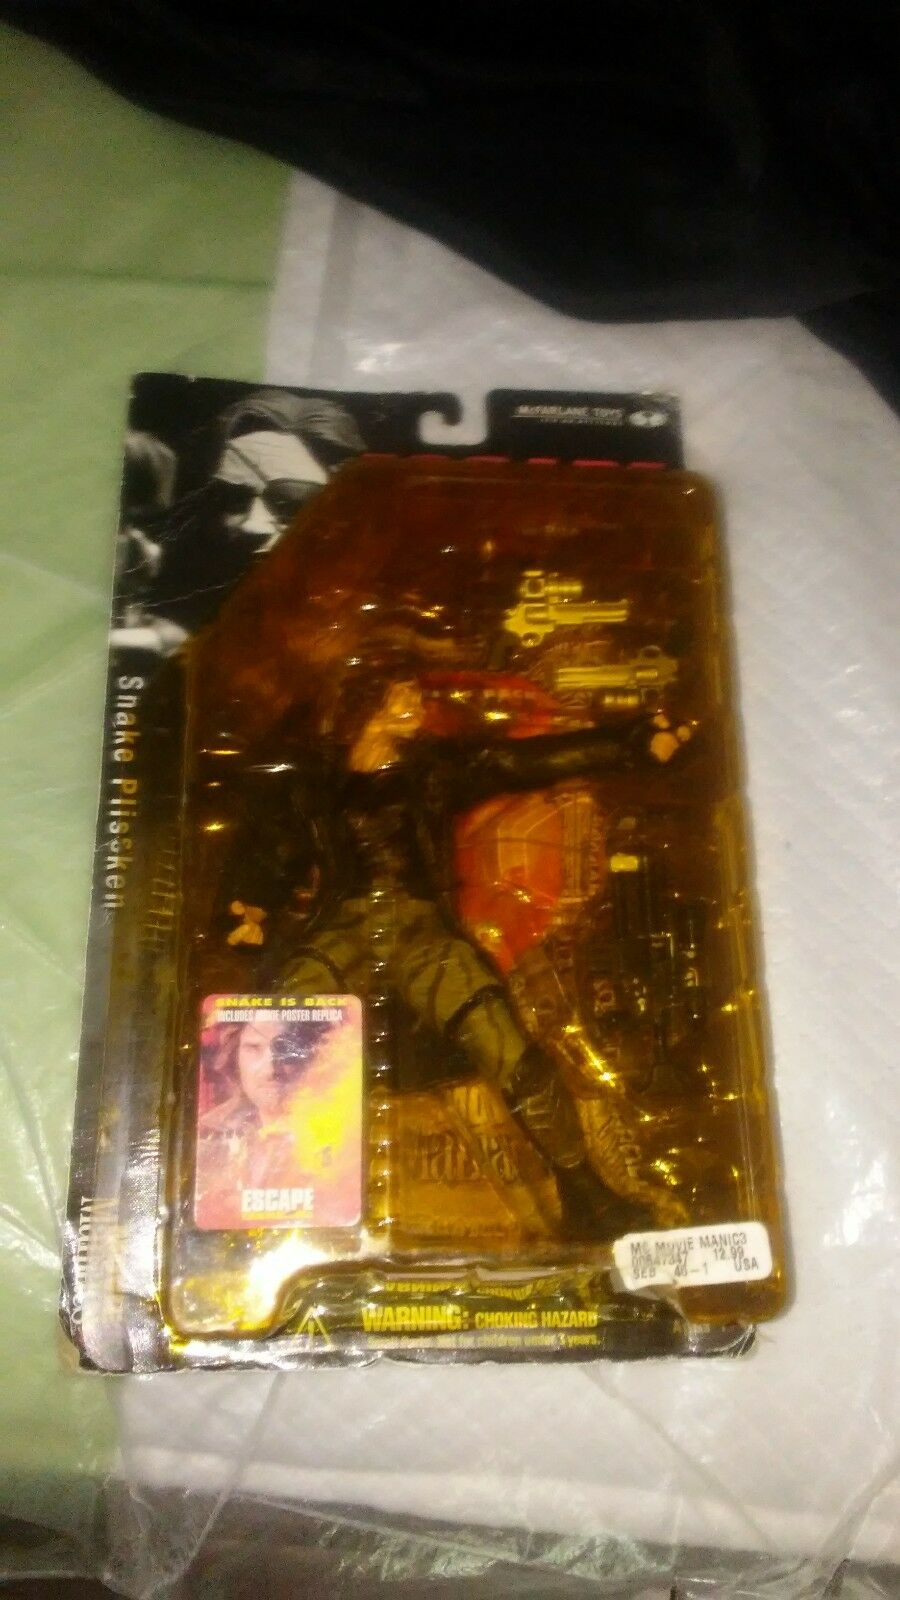 SNAKE PLISSKIN Escape From LA McFarlane Action Figure Movie Maniacs 3